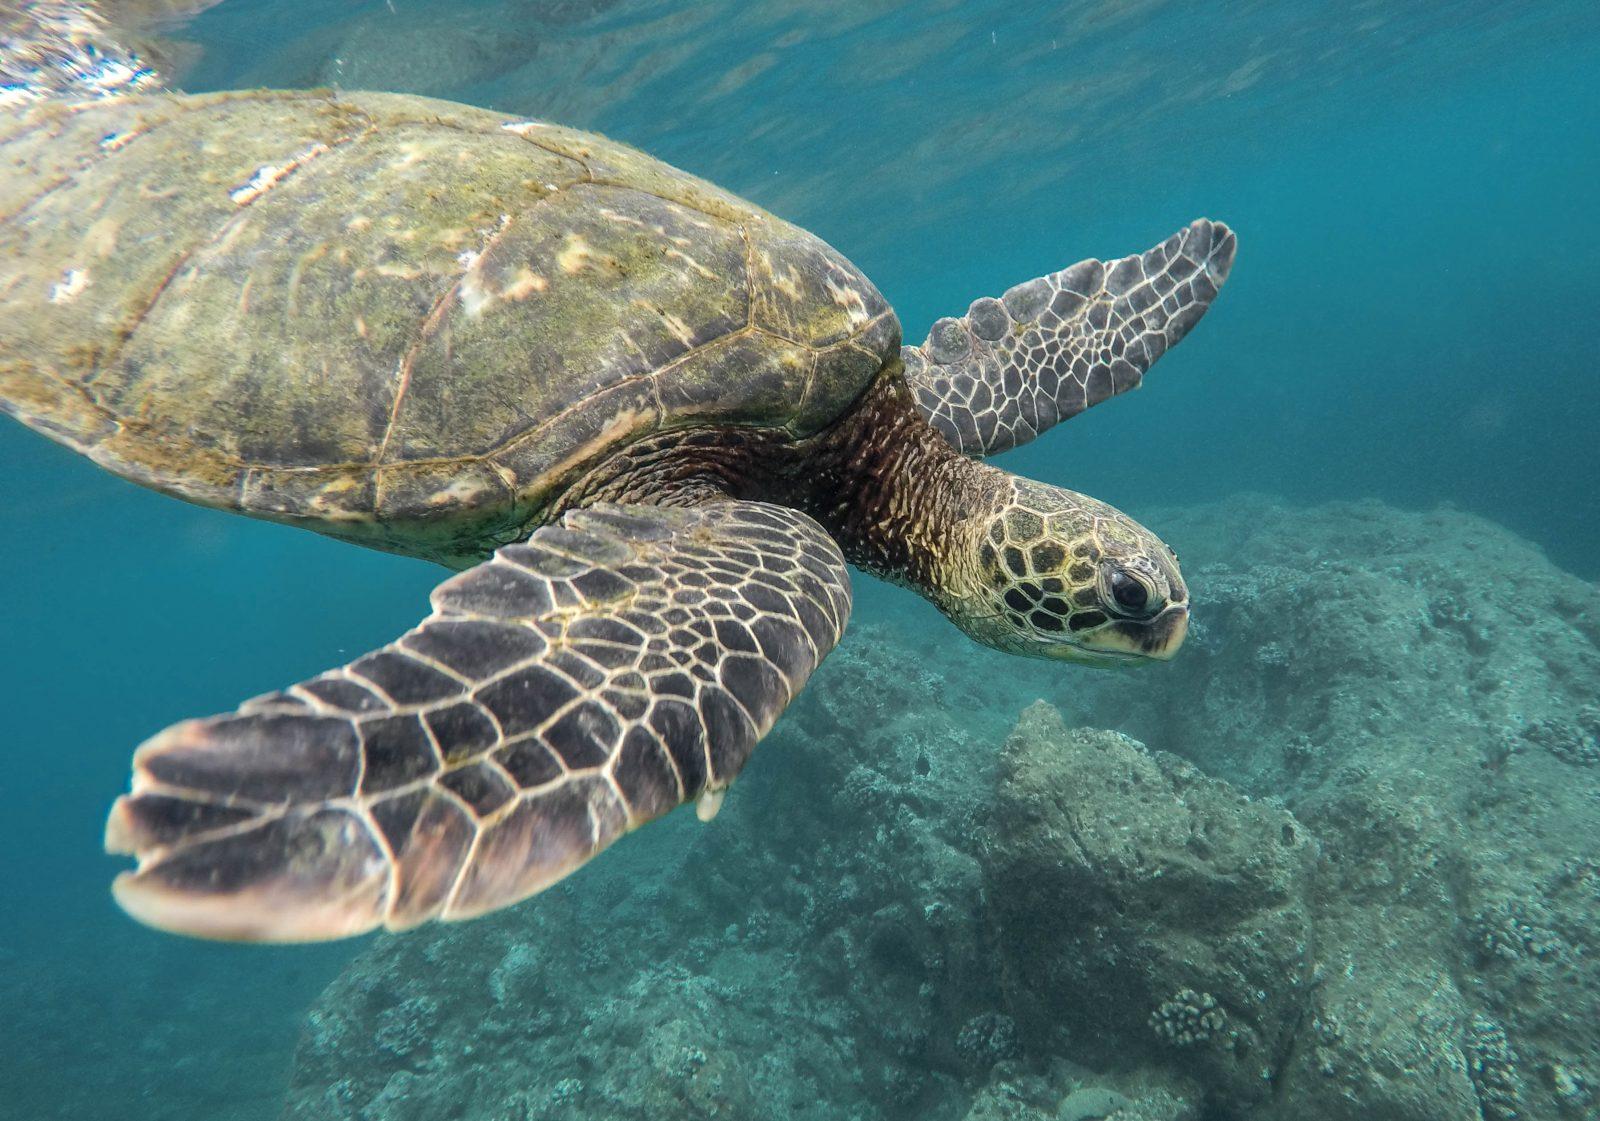 East Coast of Australia Great Barrier Reef